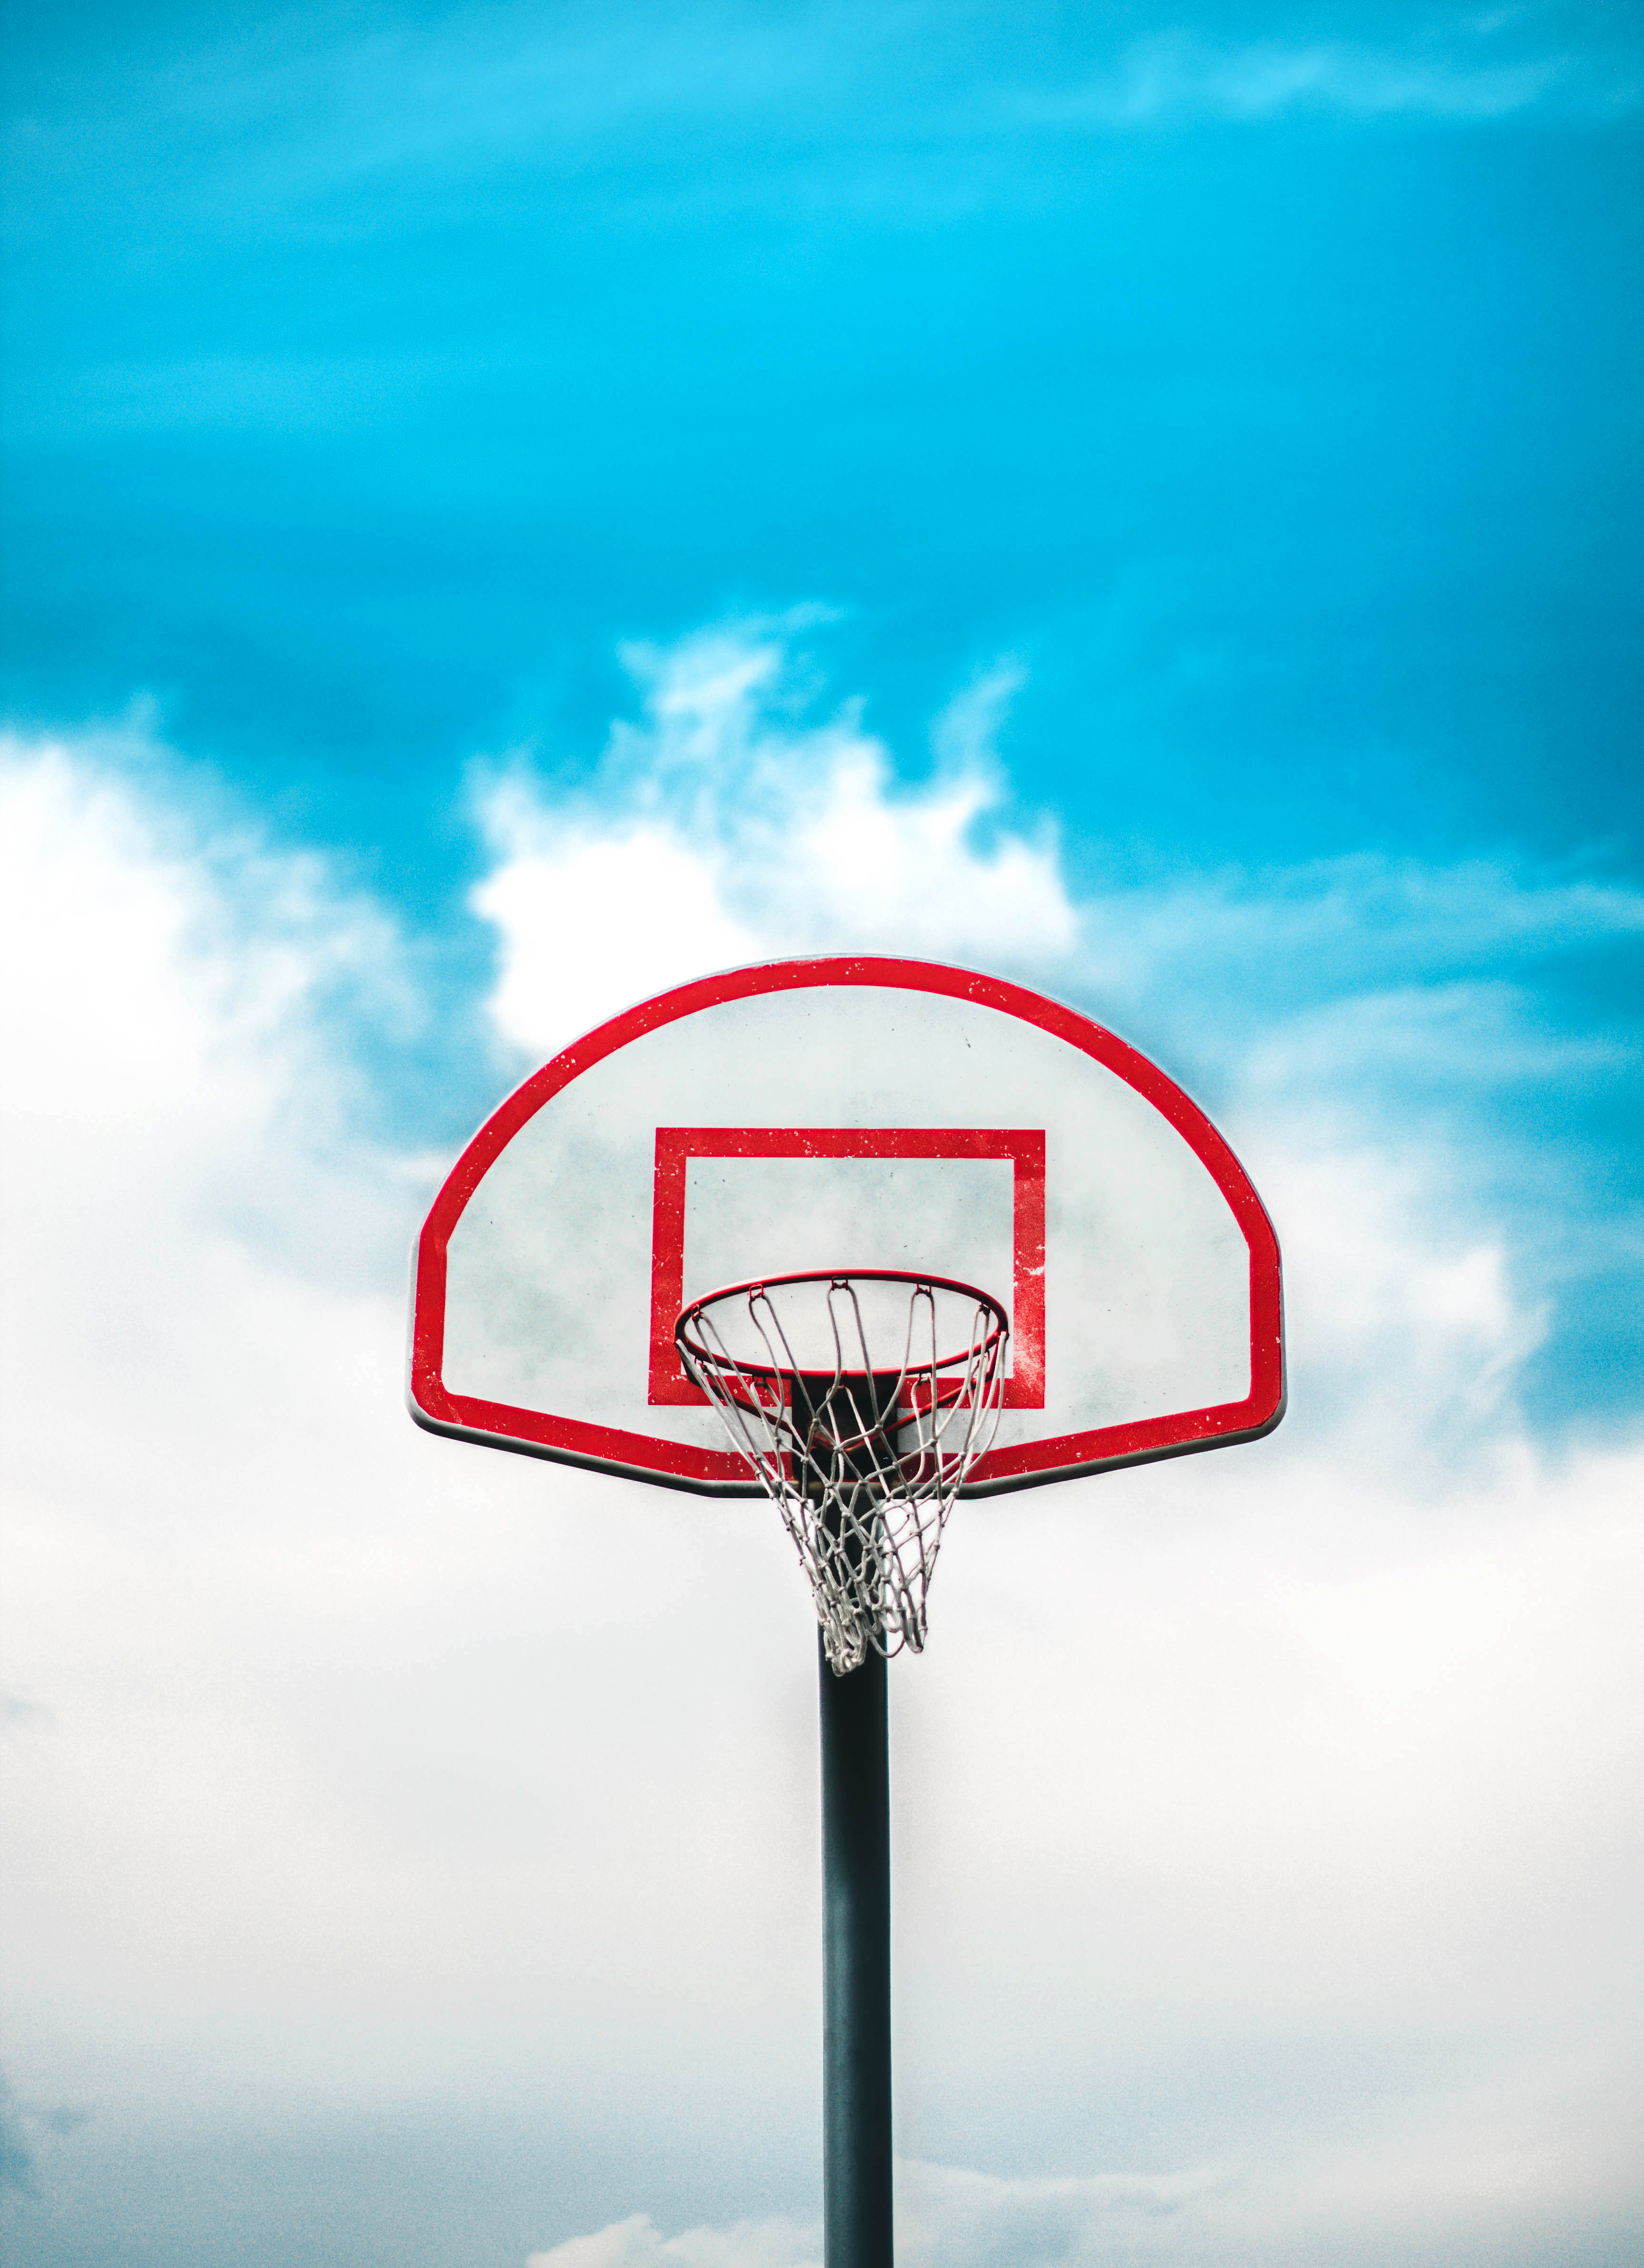 basketball hoop wallpaper  Basketball Hoop Pictures [HD] | Download Free Images on Unsplash